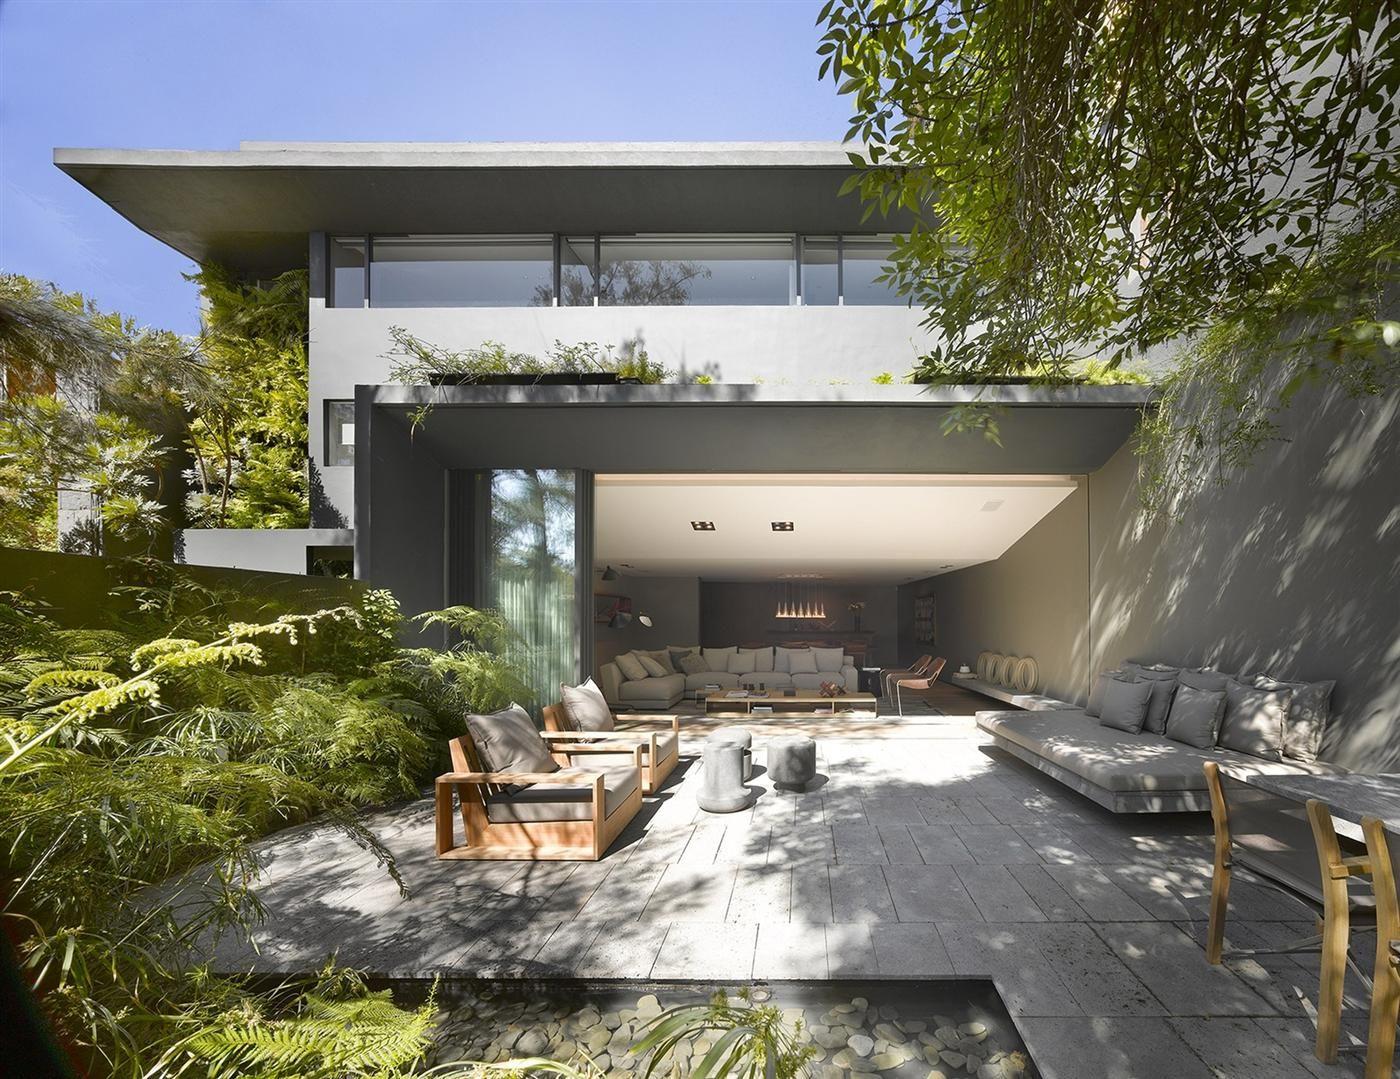 The Barranca House in Mexico City